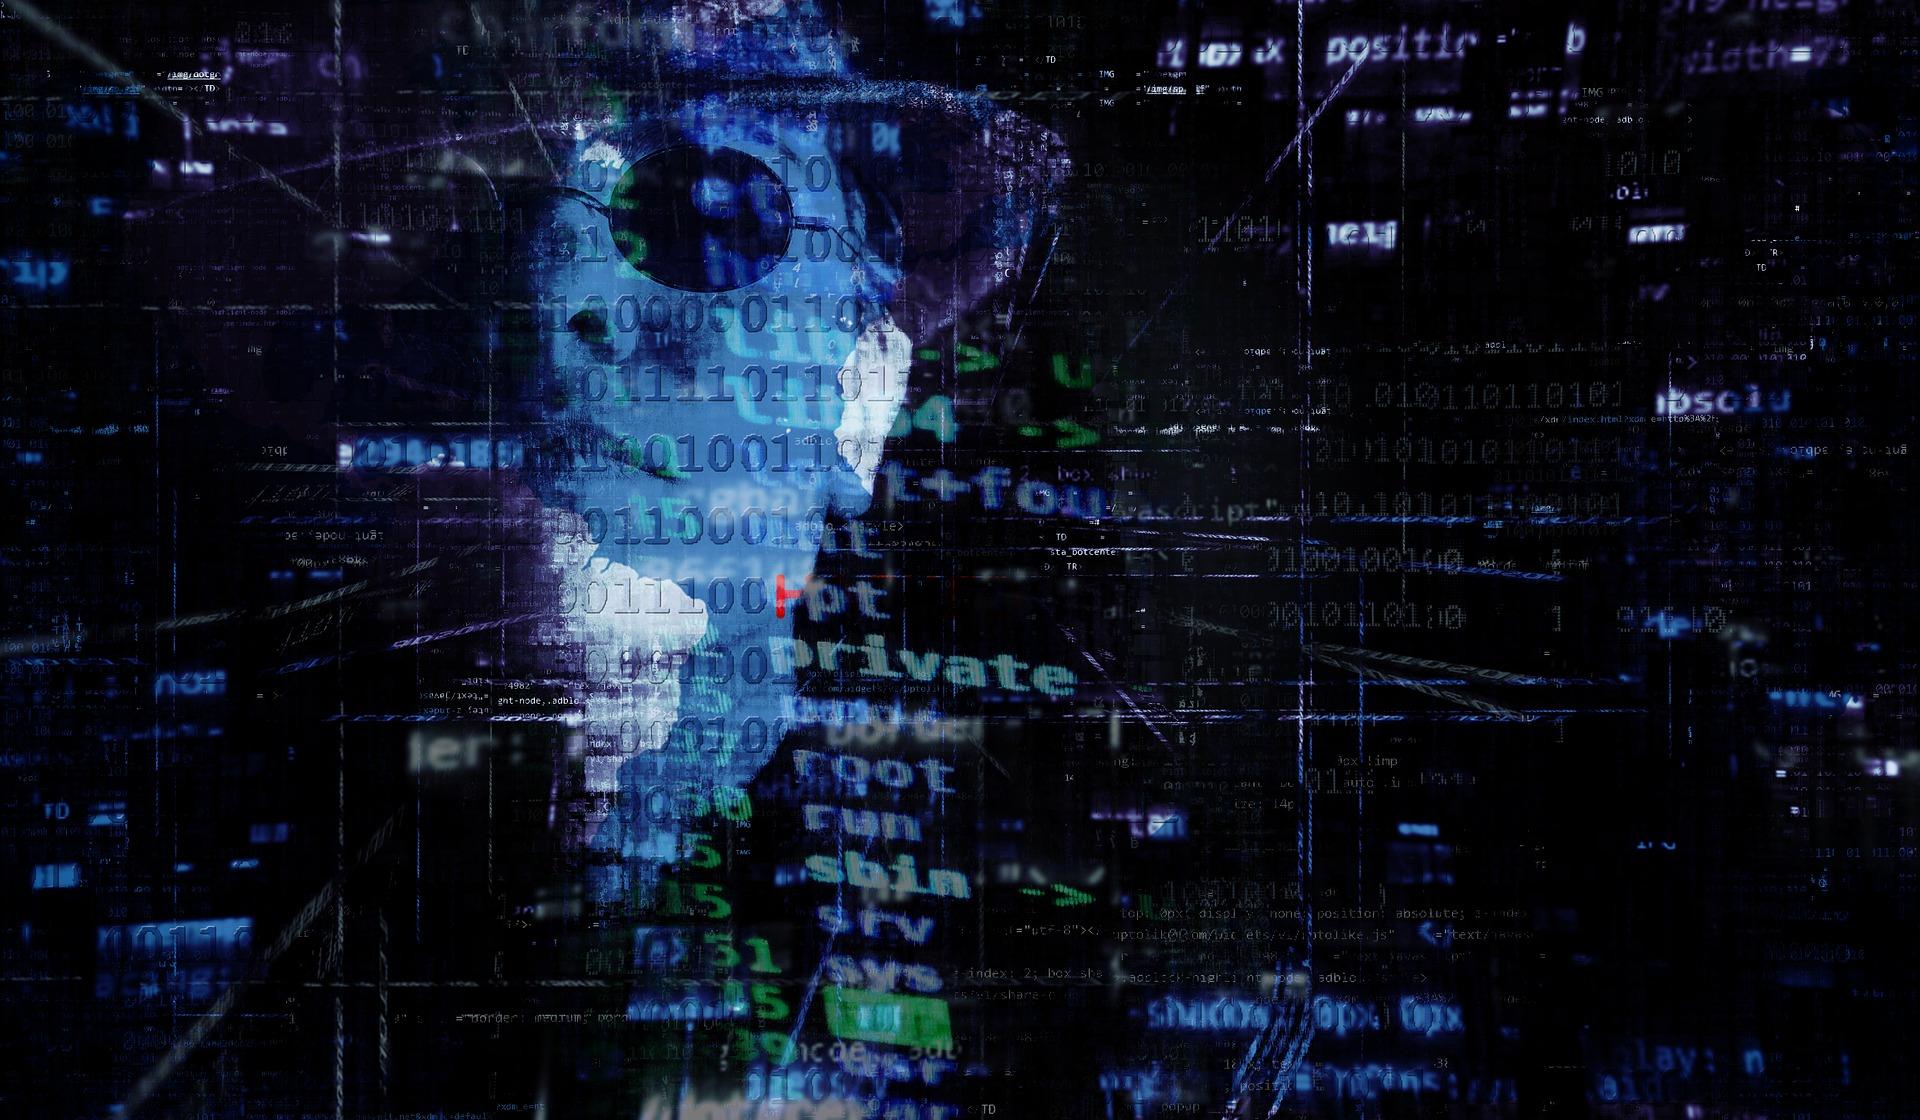 revil ransomware